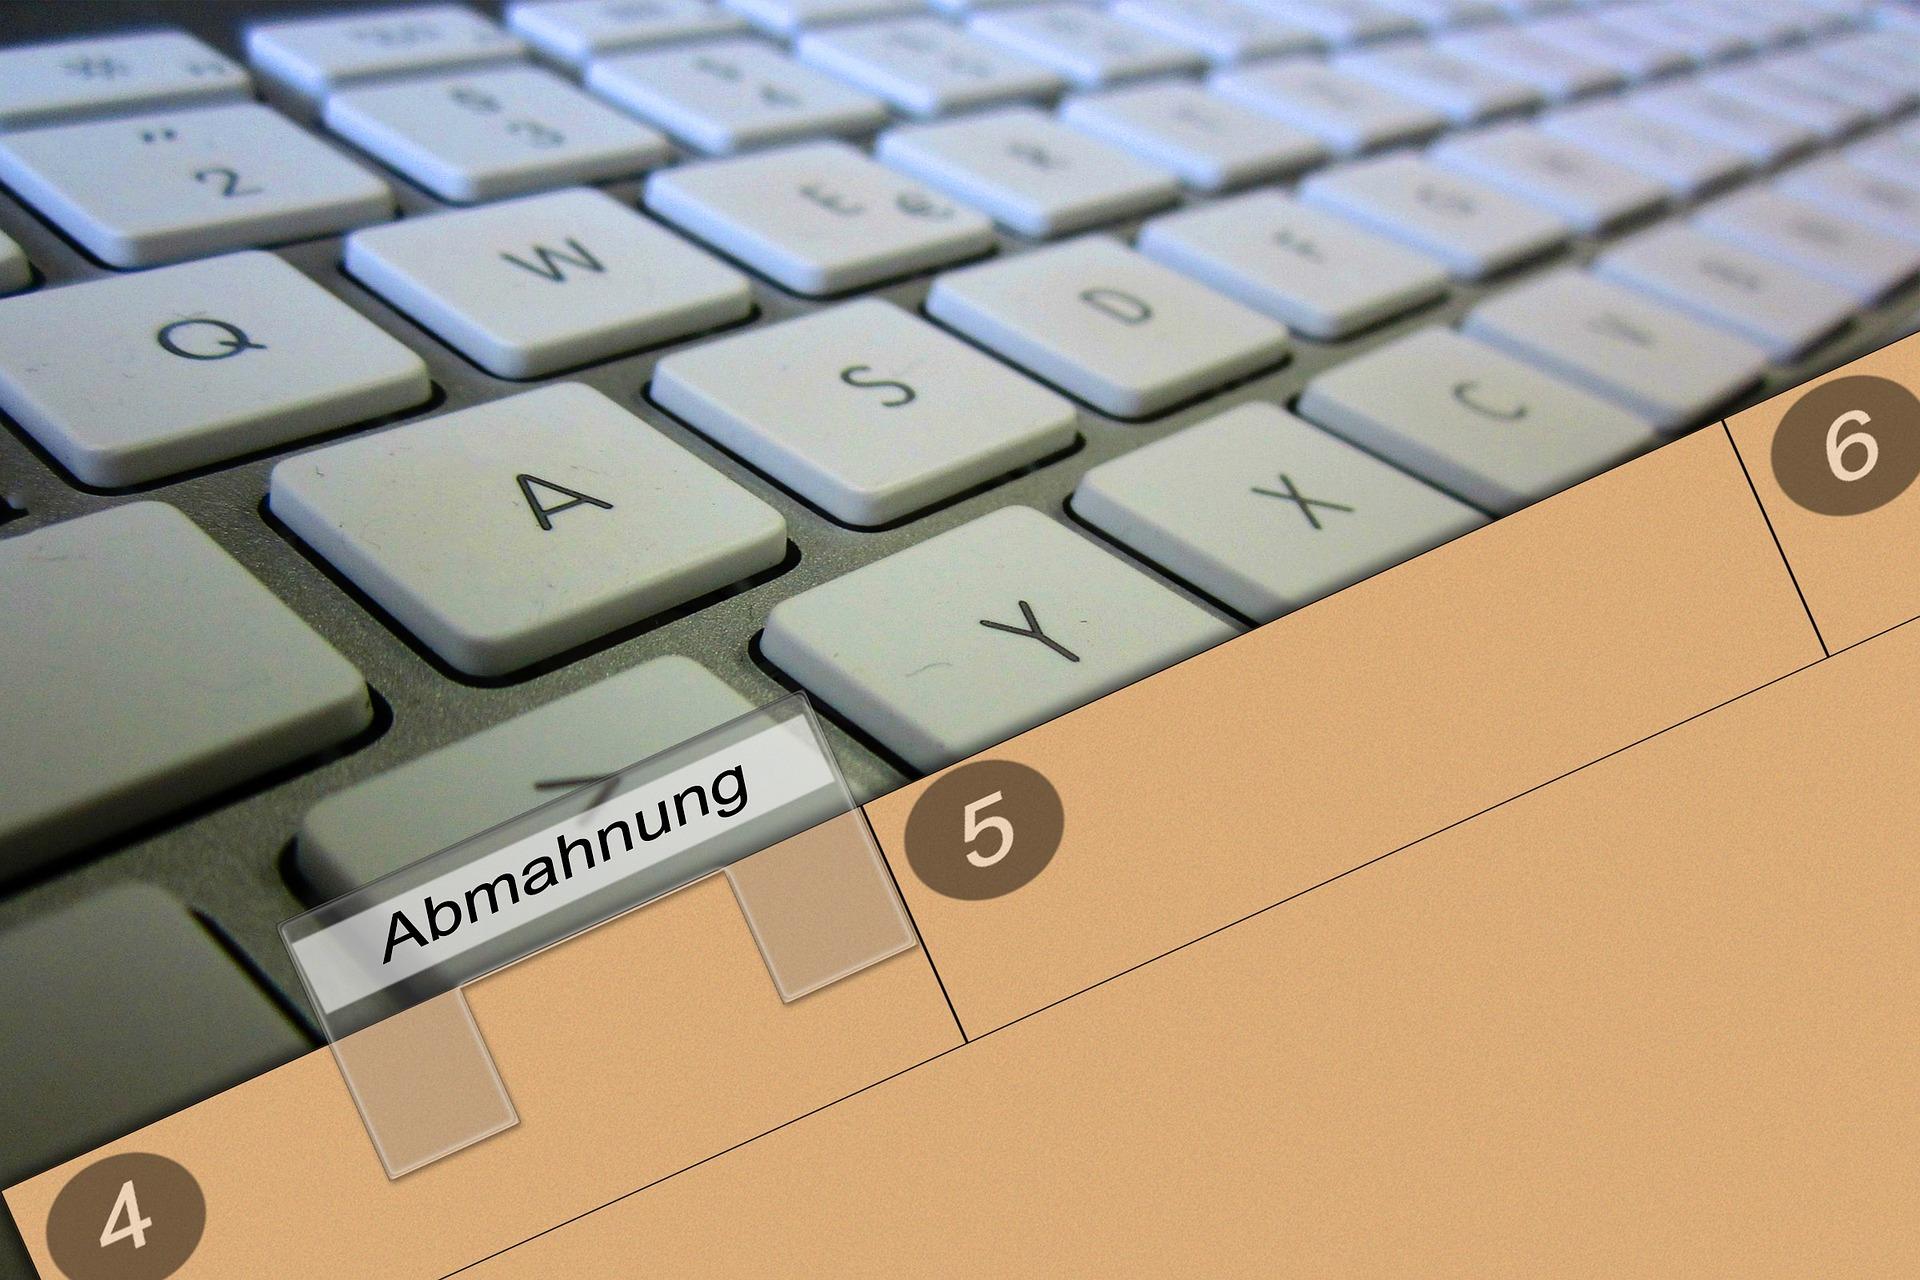 keyboard-286442_1920